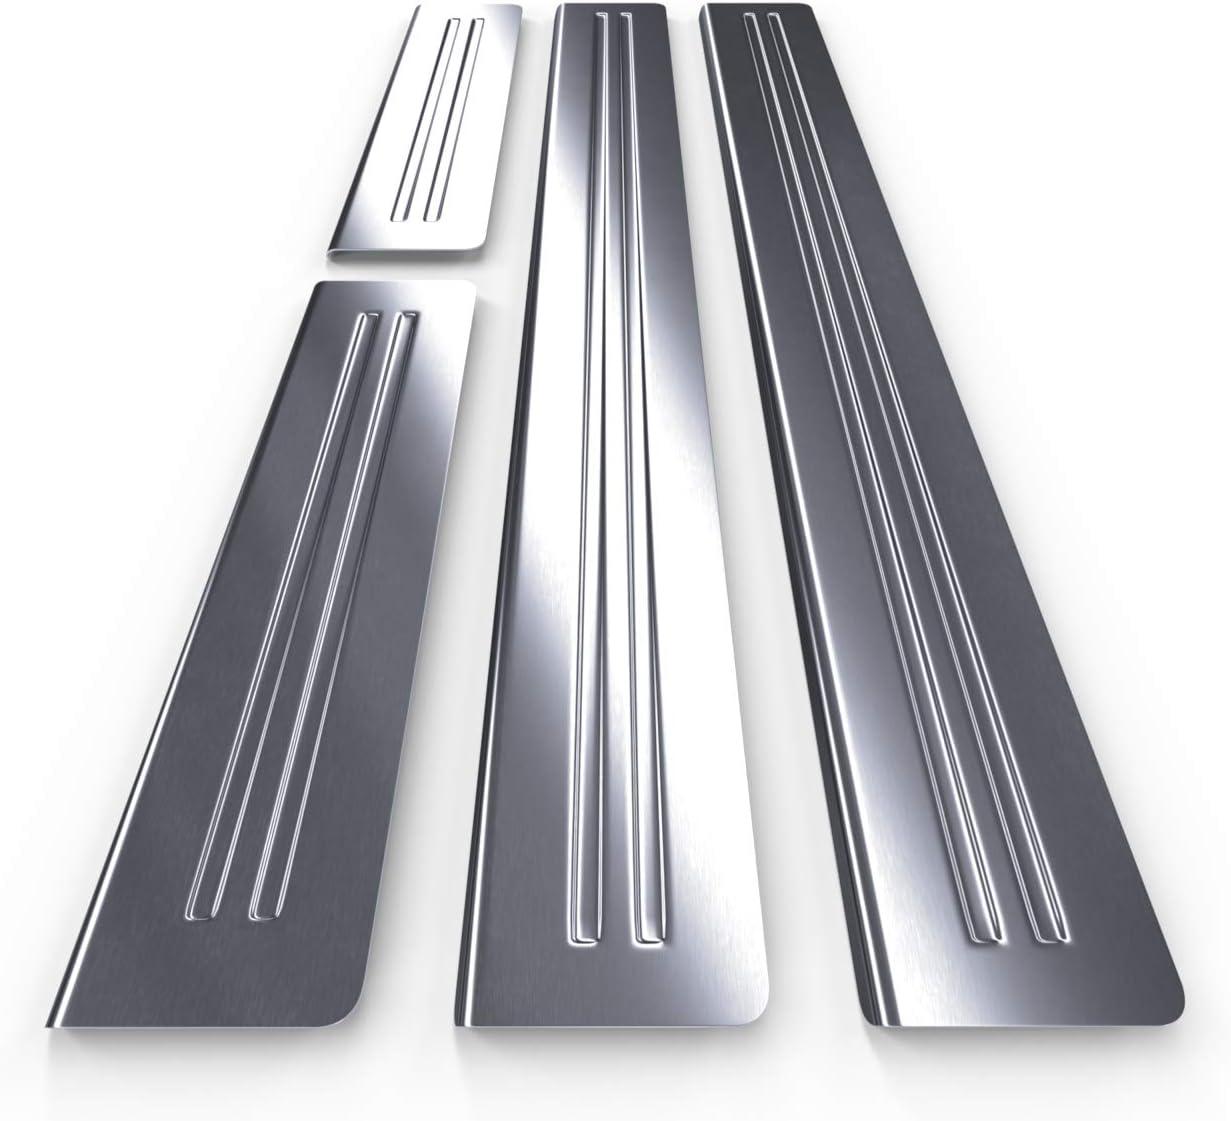 kit de 4 piezas Protectores de acero para umbral de coche 5902538682756 mate plata